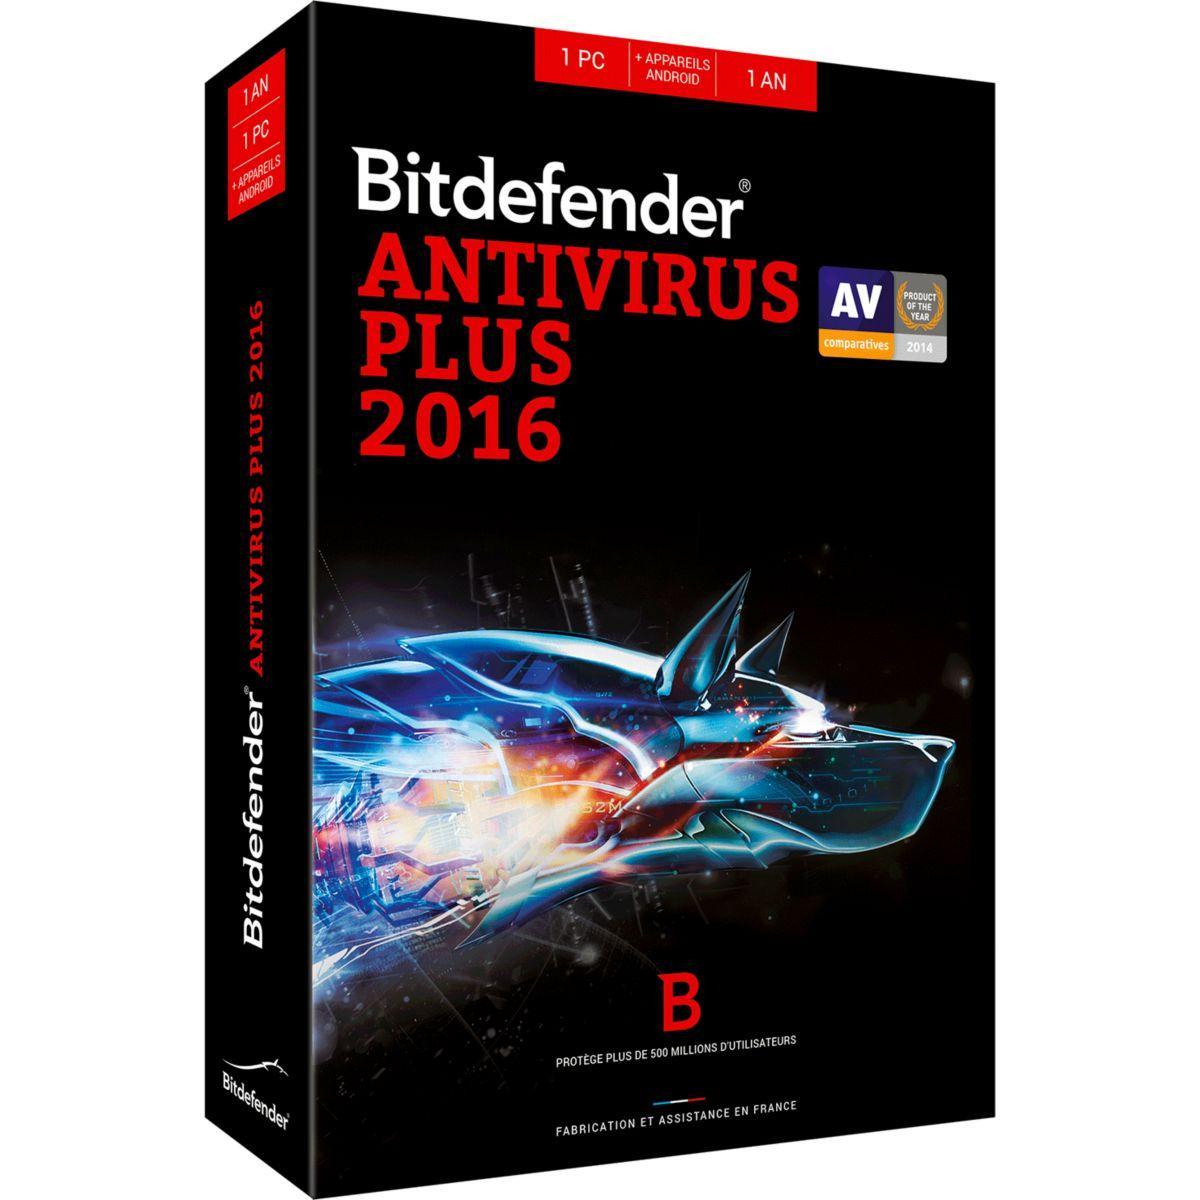 Logiciel pc bitdefender bitdefender antivirus - 5% de remise immédiate avec le code : unpeu